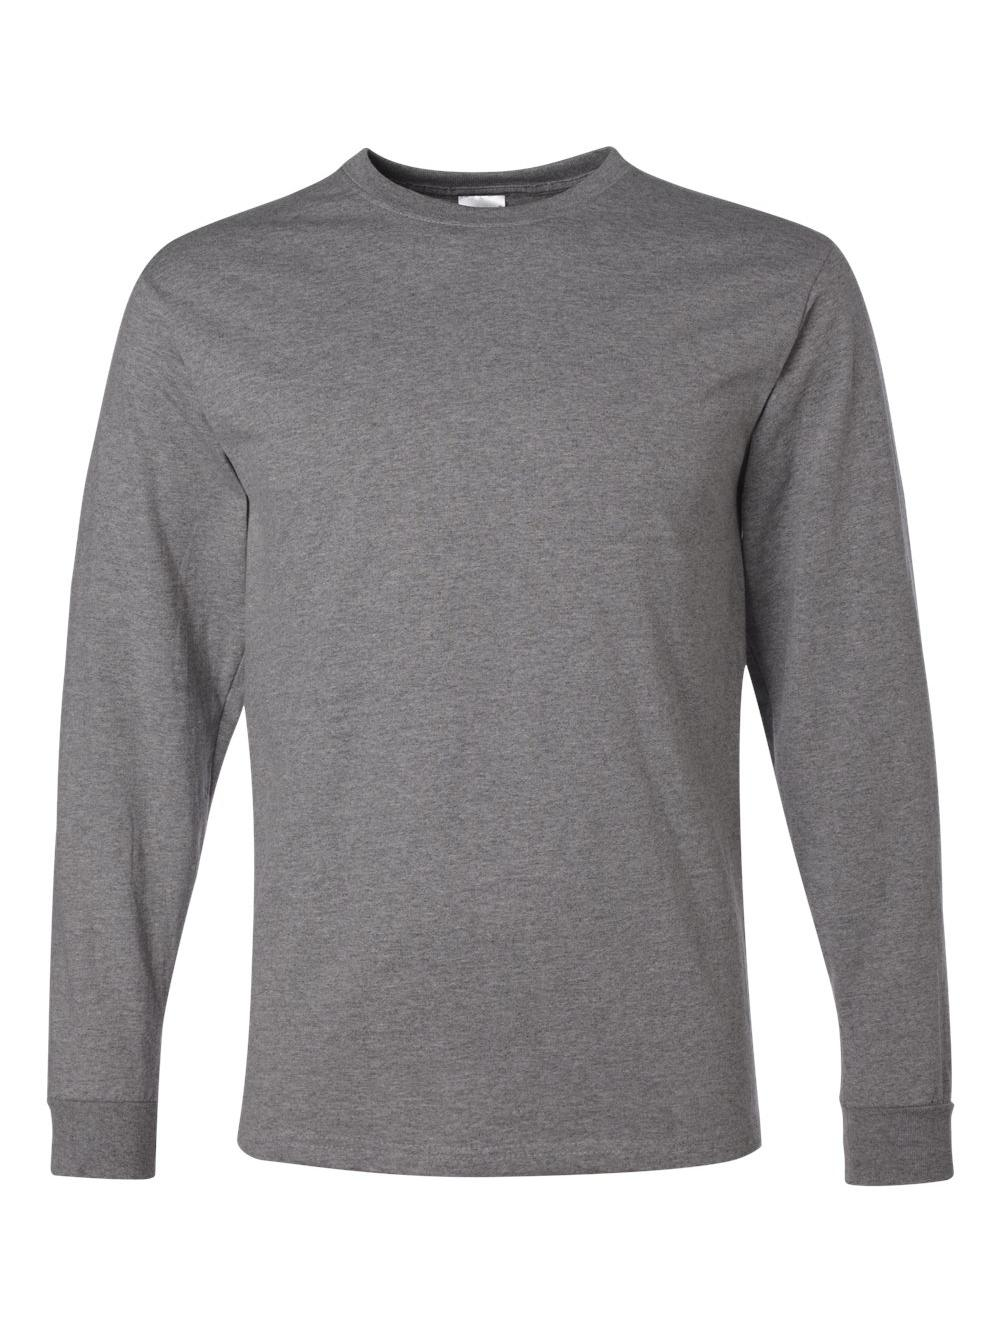 Jerzees-Dri-Power-Long-Sleeve-50-50-T-Shirt-29LSR thumbnail 66